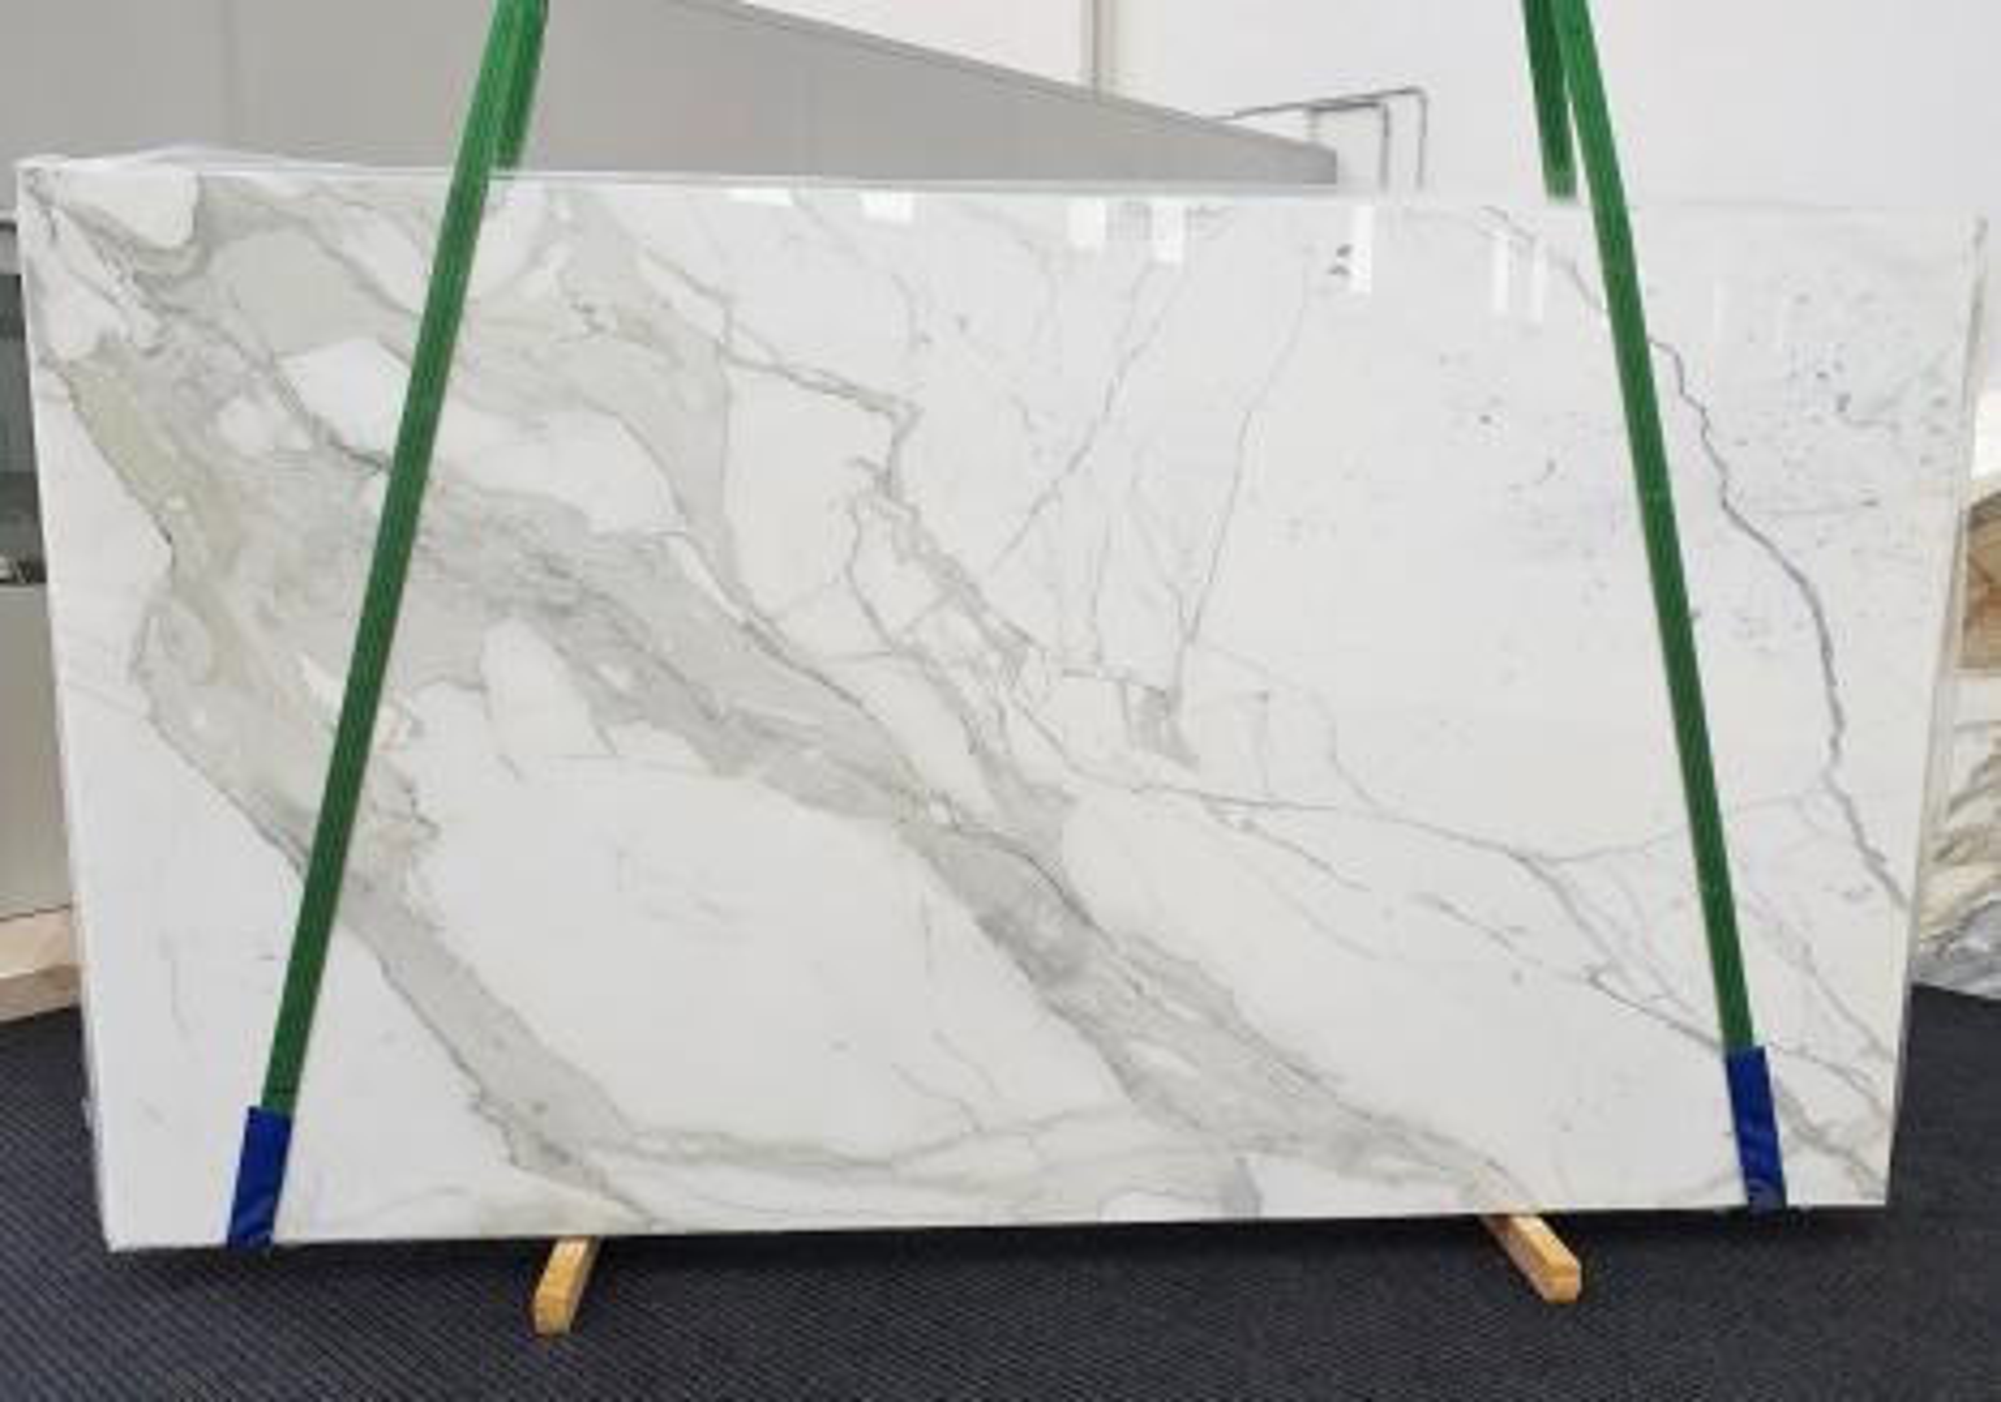 CALACATTA EXTRA Supply Veneto (Italy) polished slabs 1377 , Slab #54 natural marble